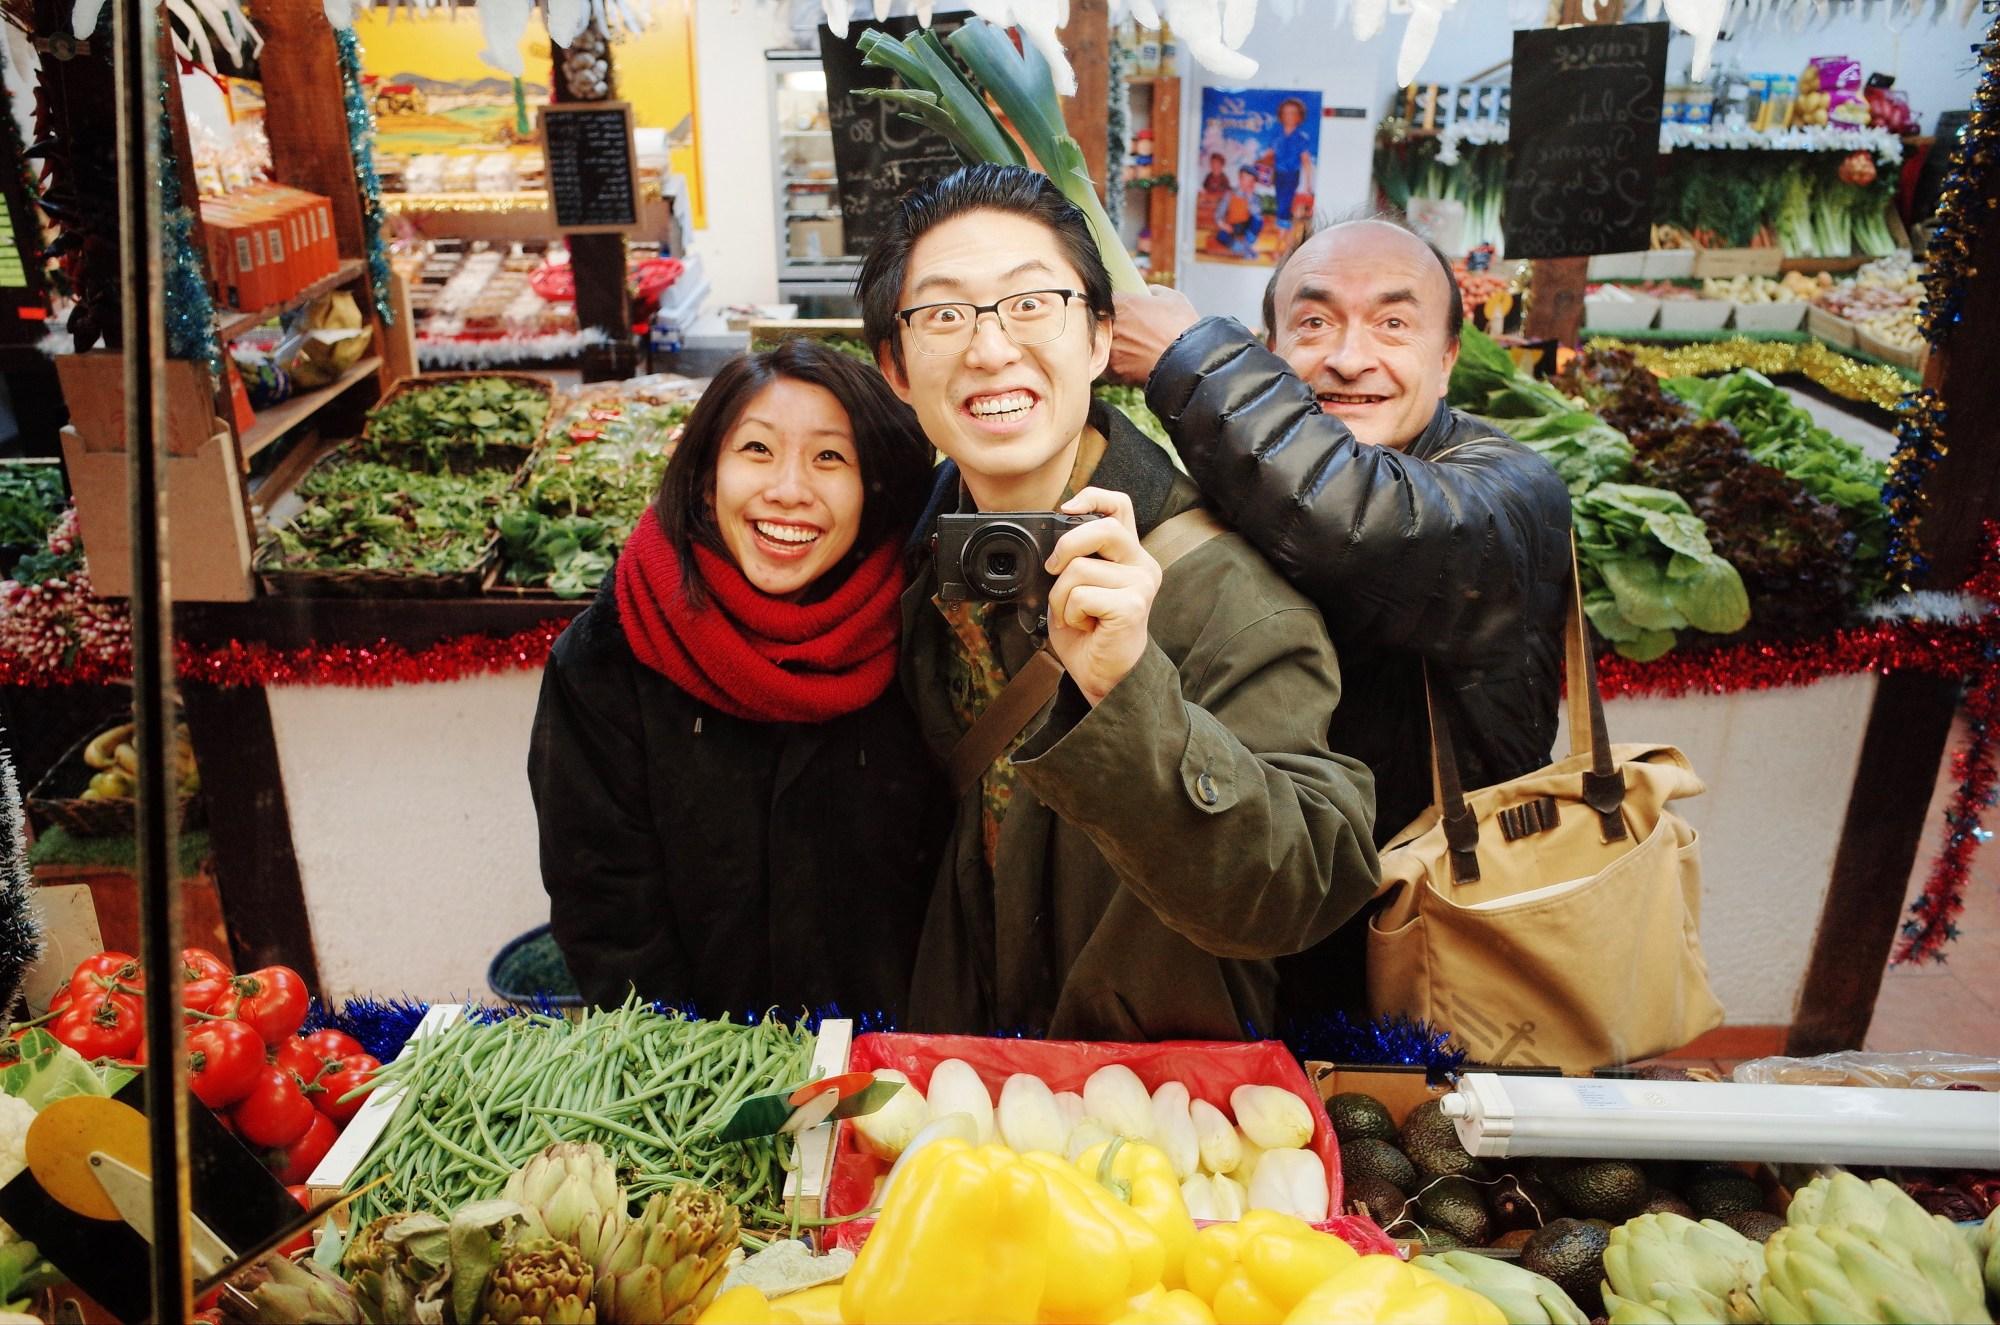 Yves selfie at market